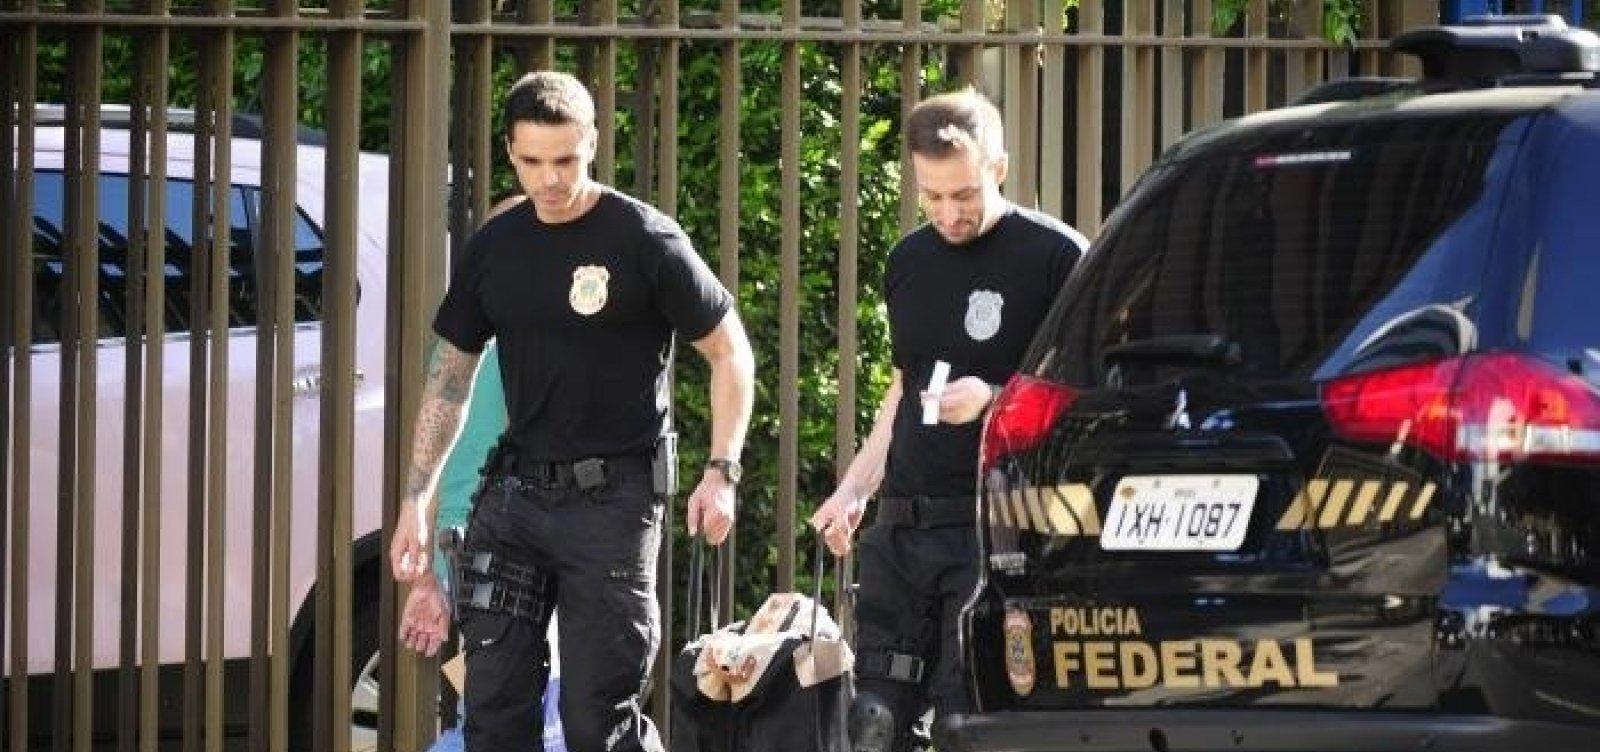 [Polícia Federal realiza buscas para apurar propinas da Odebrecht ]